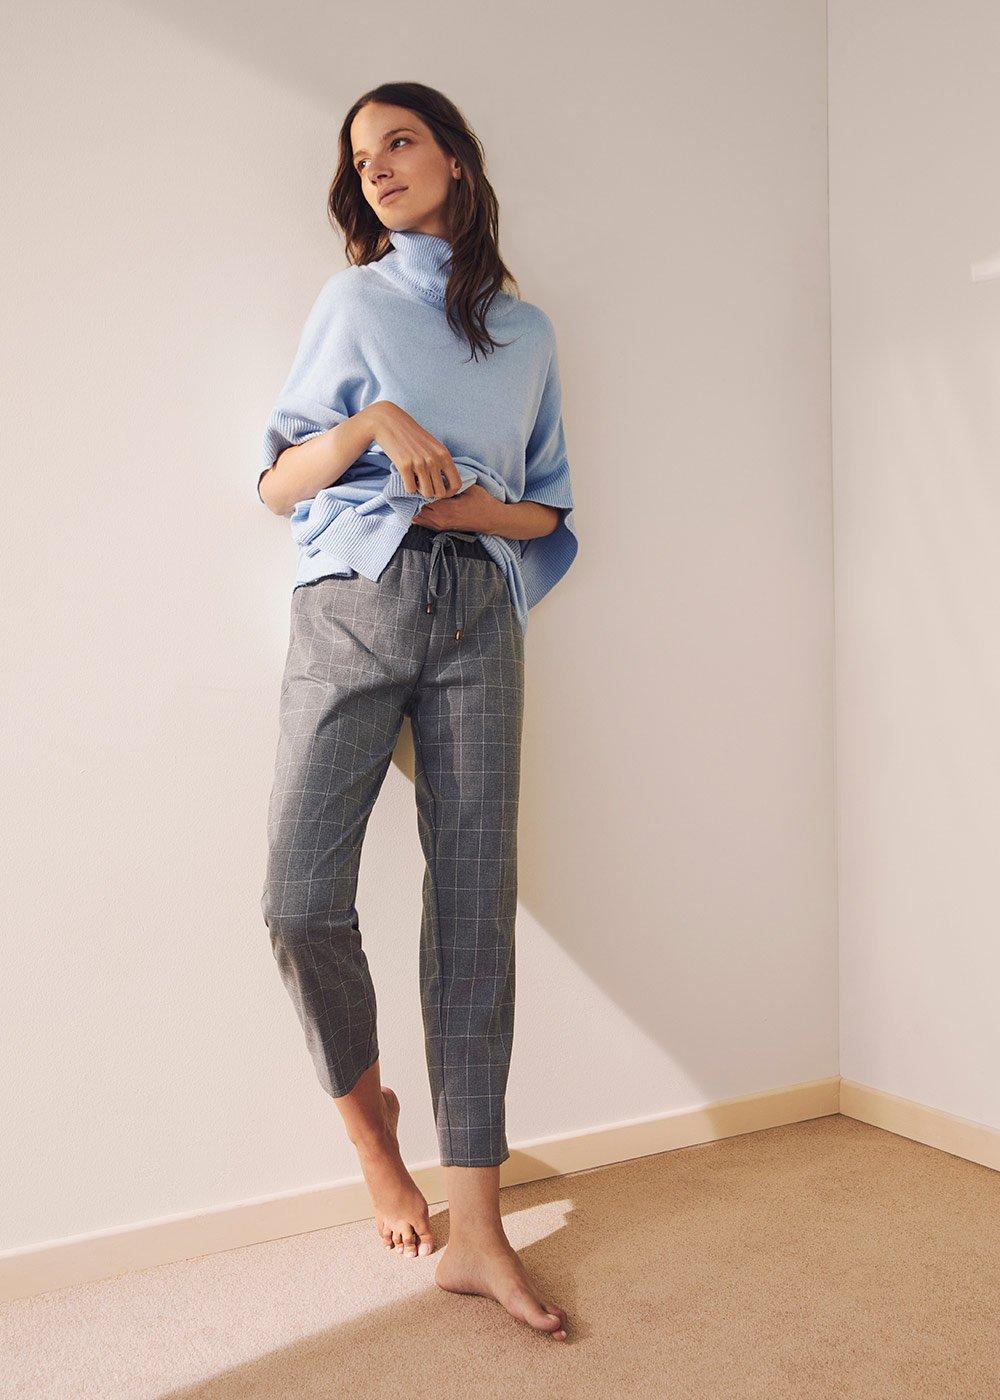 Pantalone Cara in tessuto flanella - Light grey\White Fantasia - Donna